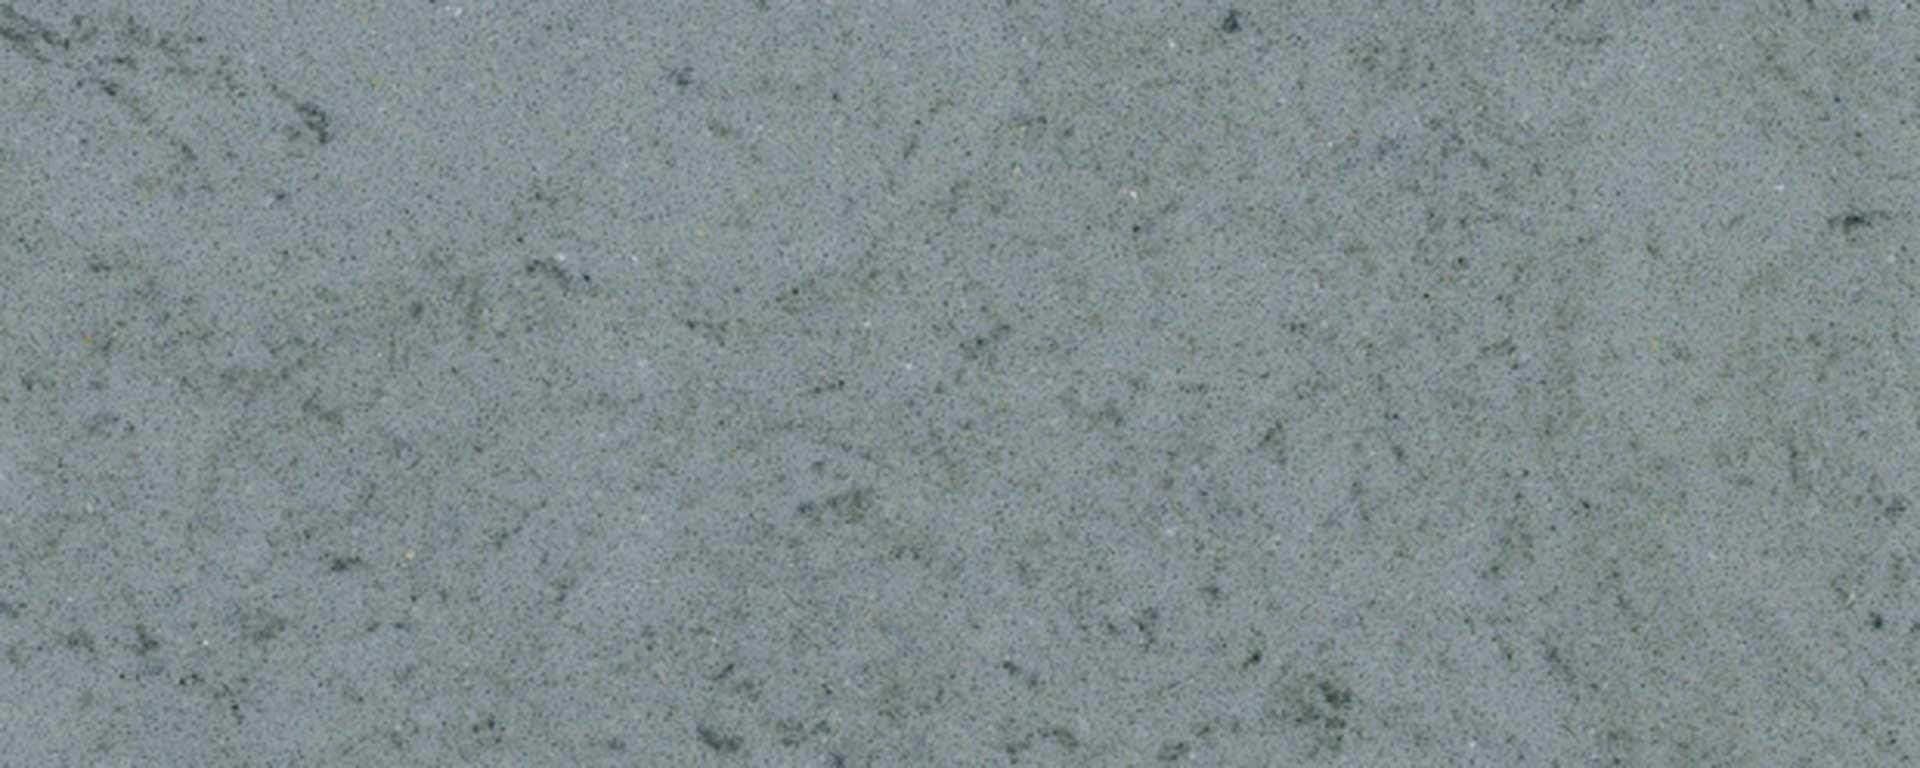 MMDR-006-terrazzo-marmo-resina-